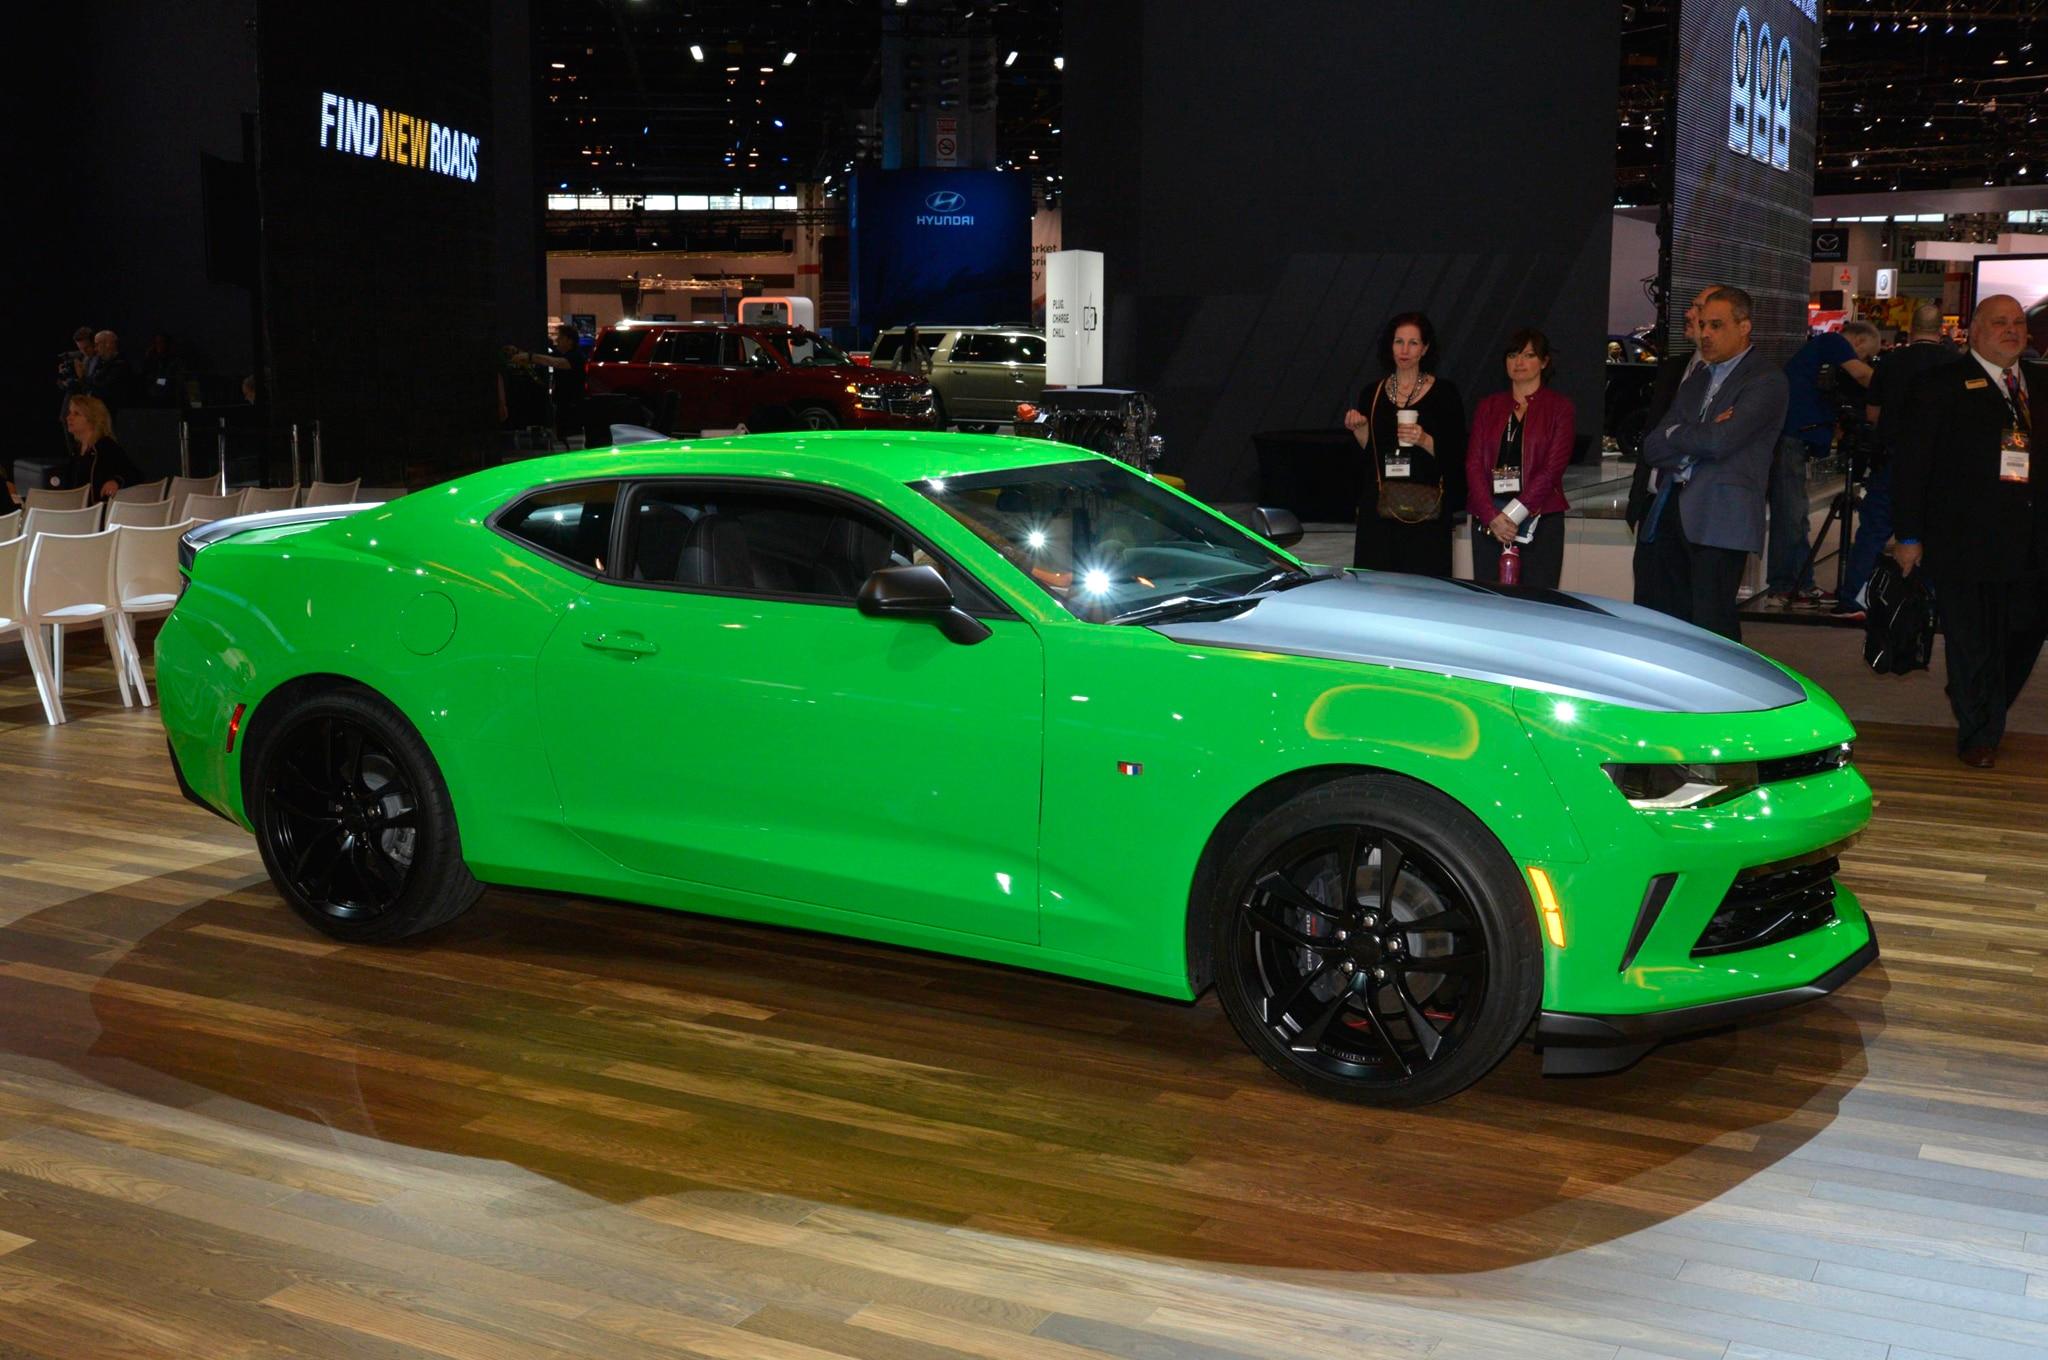 2017 Chevrolet Camaro SS 1LE, New V-6 1LE Revealed for Chicago Show